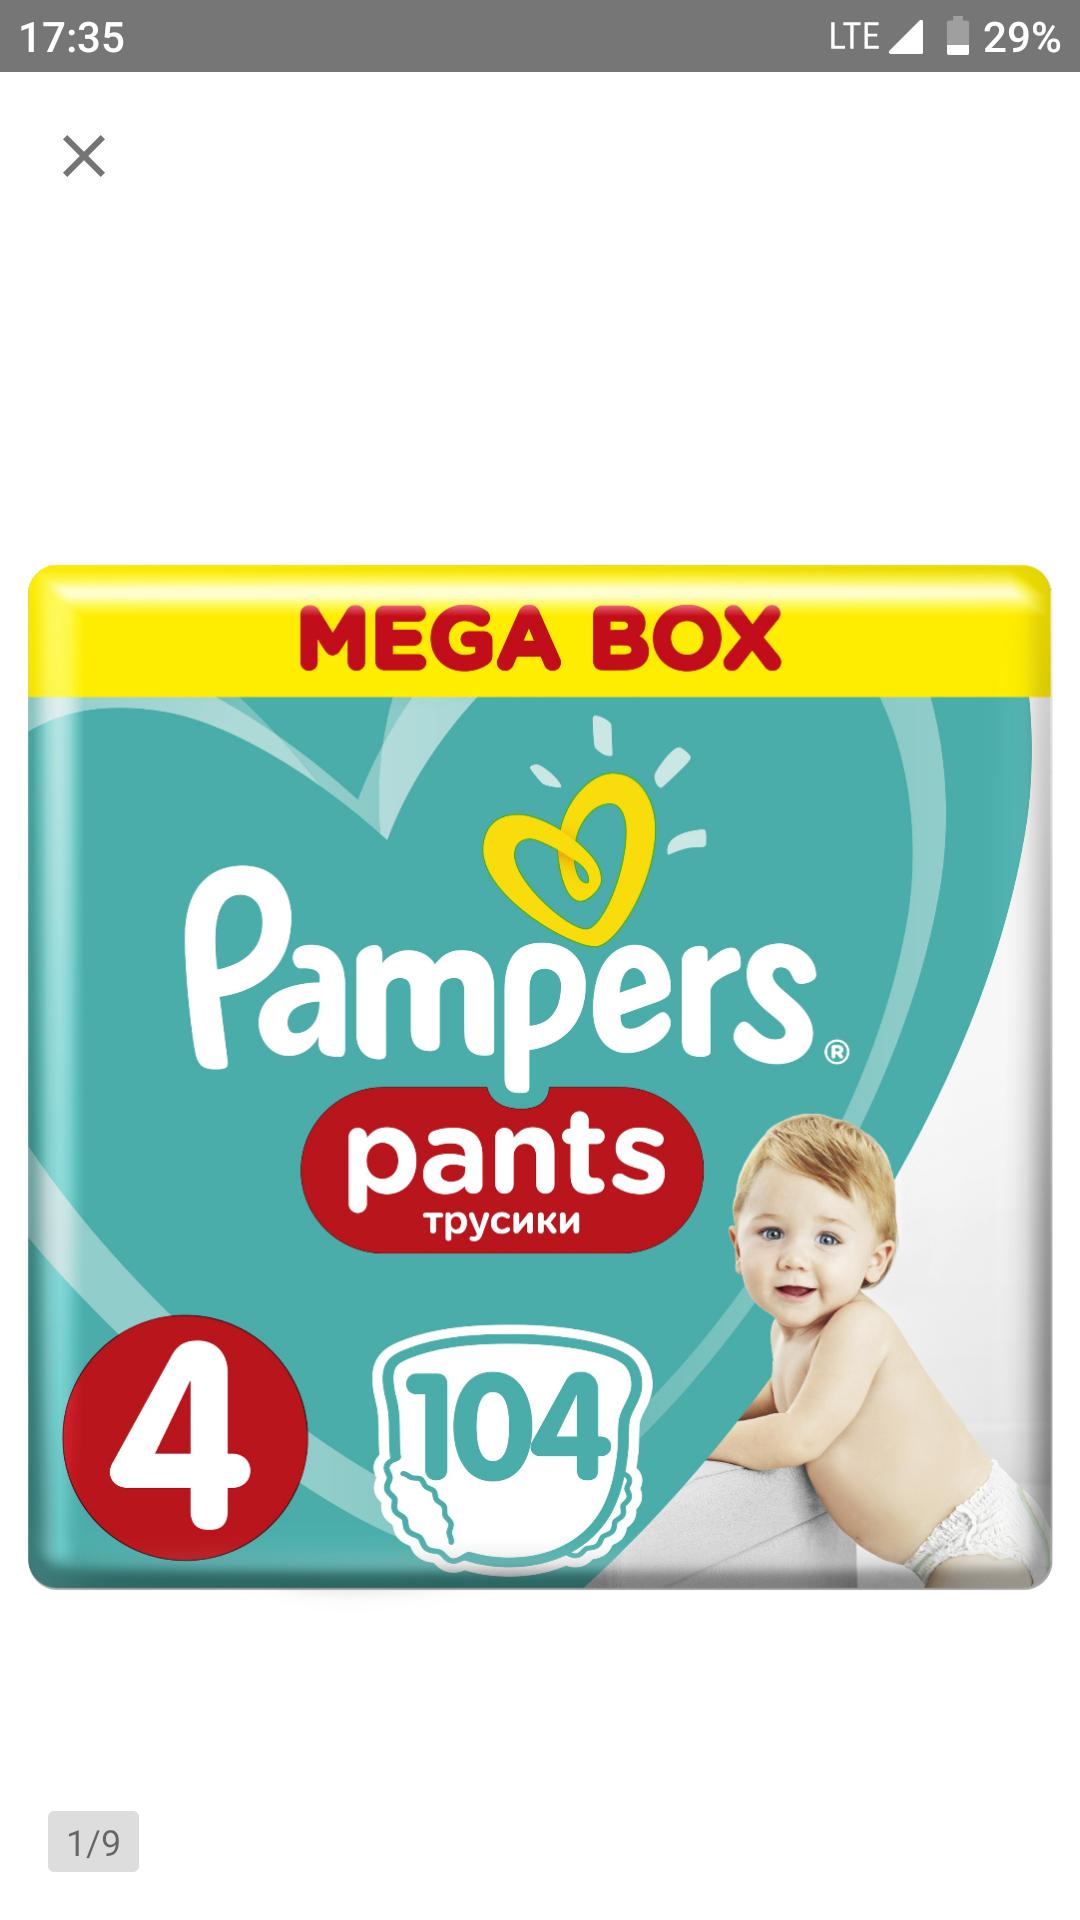 Pampers pants 4 (104sztuki) na Smart week.